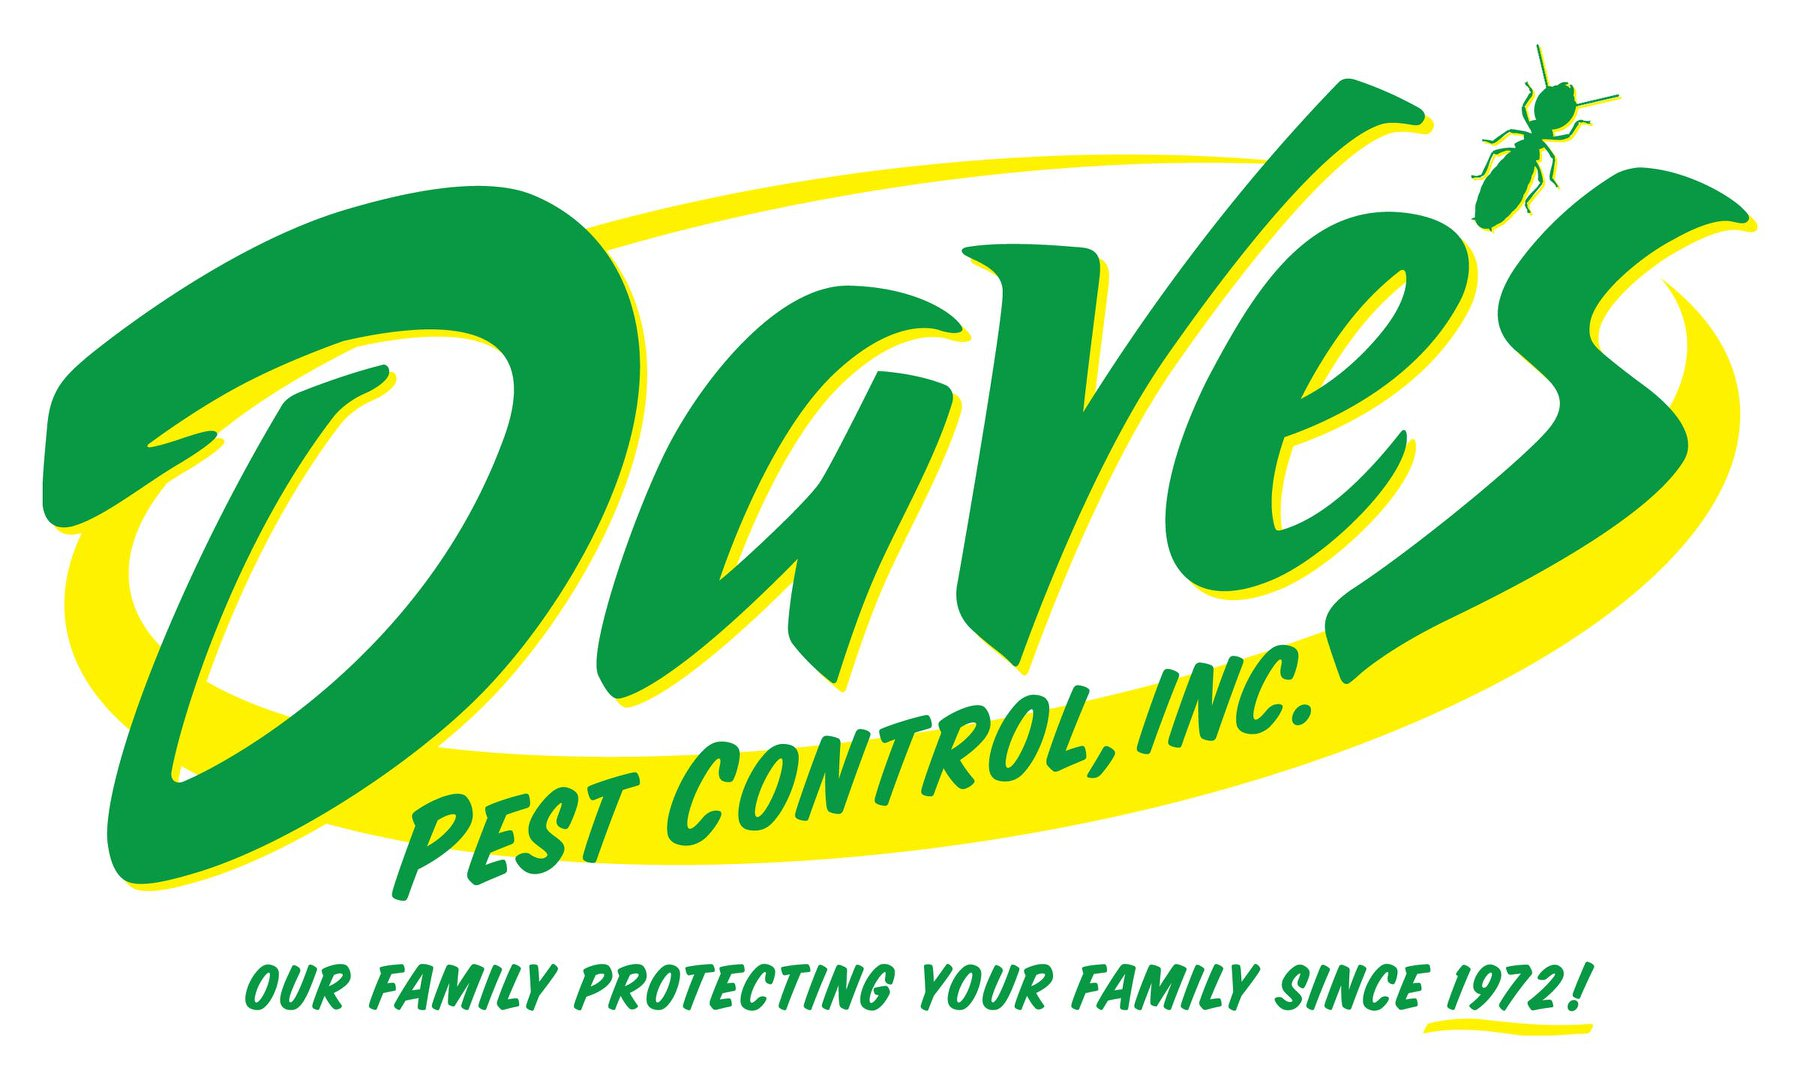 Sponsor Dave's Pest